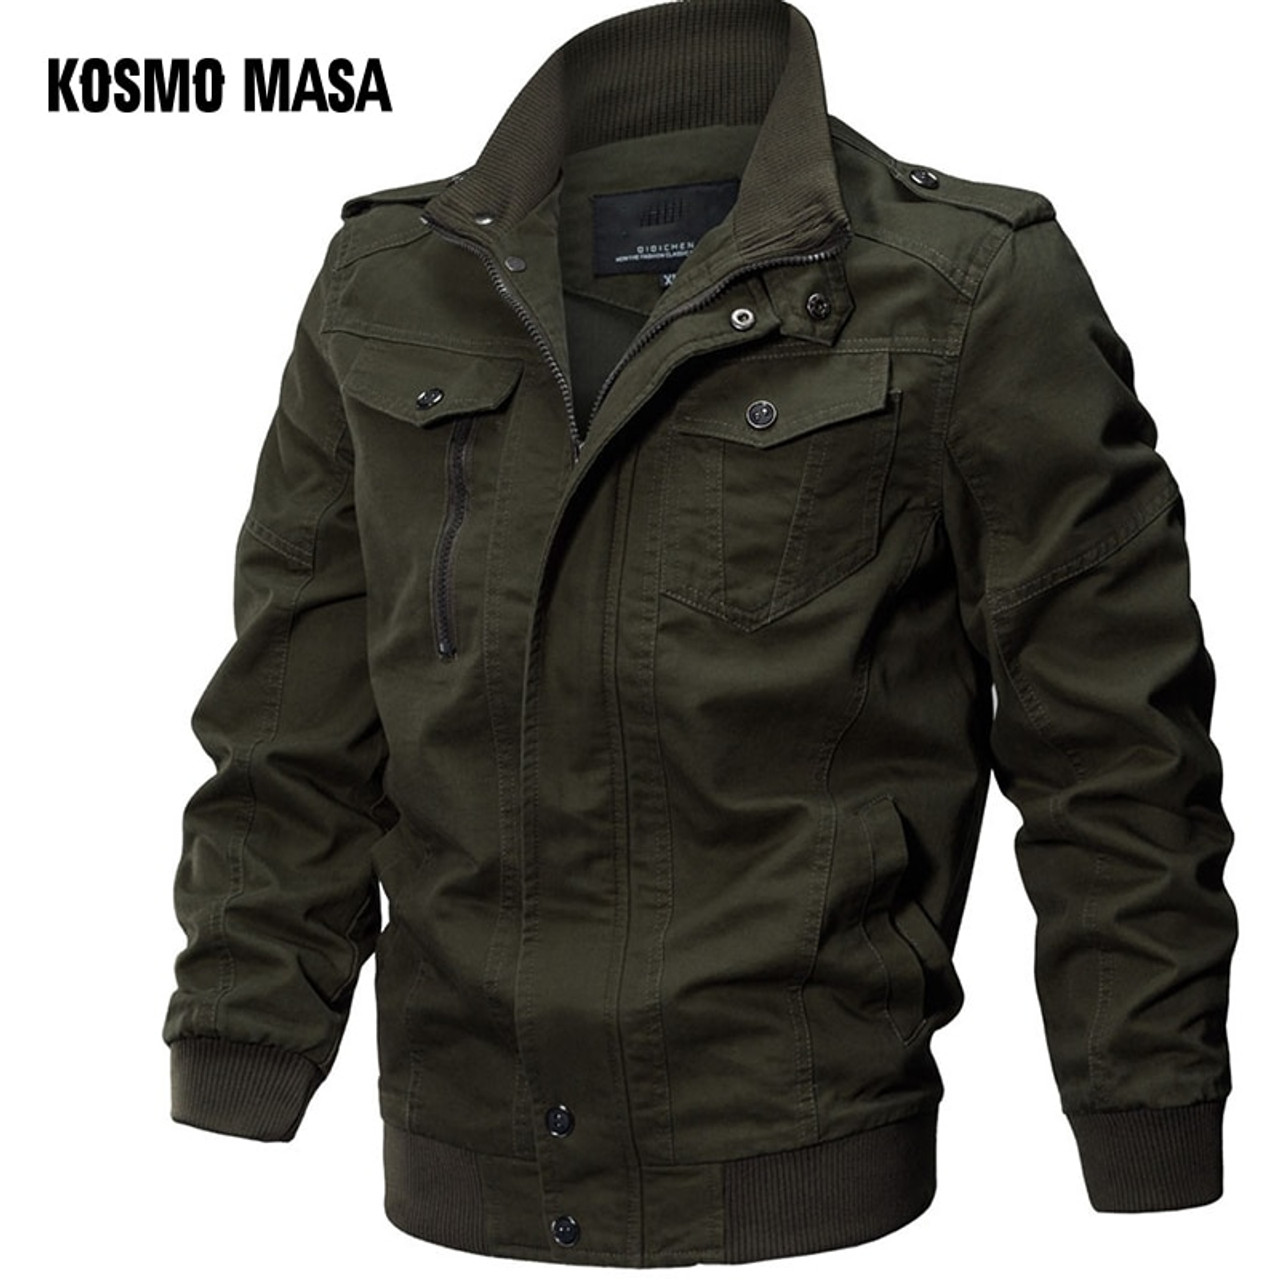 ef6609c3 KOSMO MASA Bomber Jacket Men Autumn Winter 2018 Military Mens Jackets And  Coats Black Windbreaker Jacket for Men Outwear MJ0074